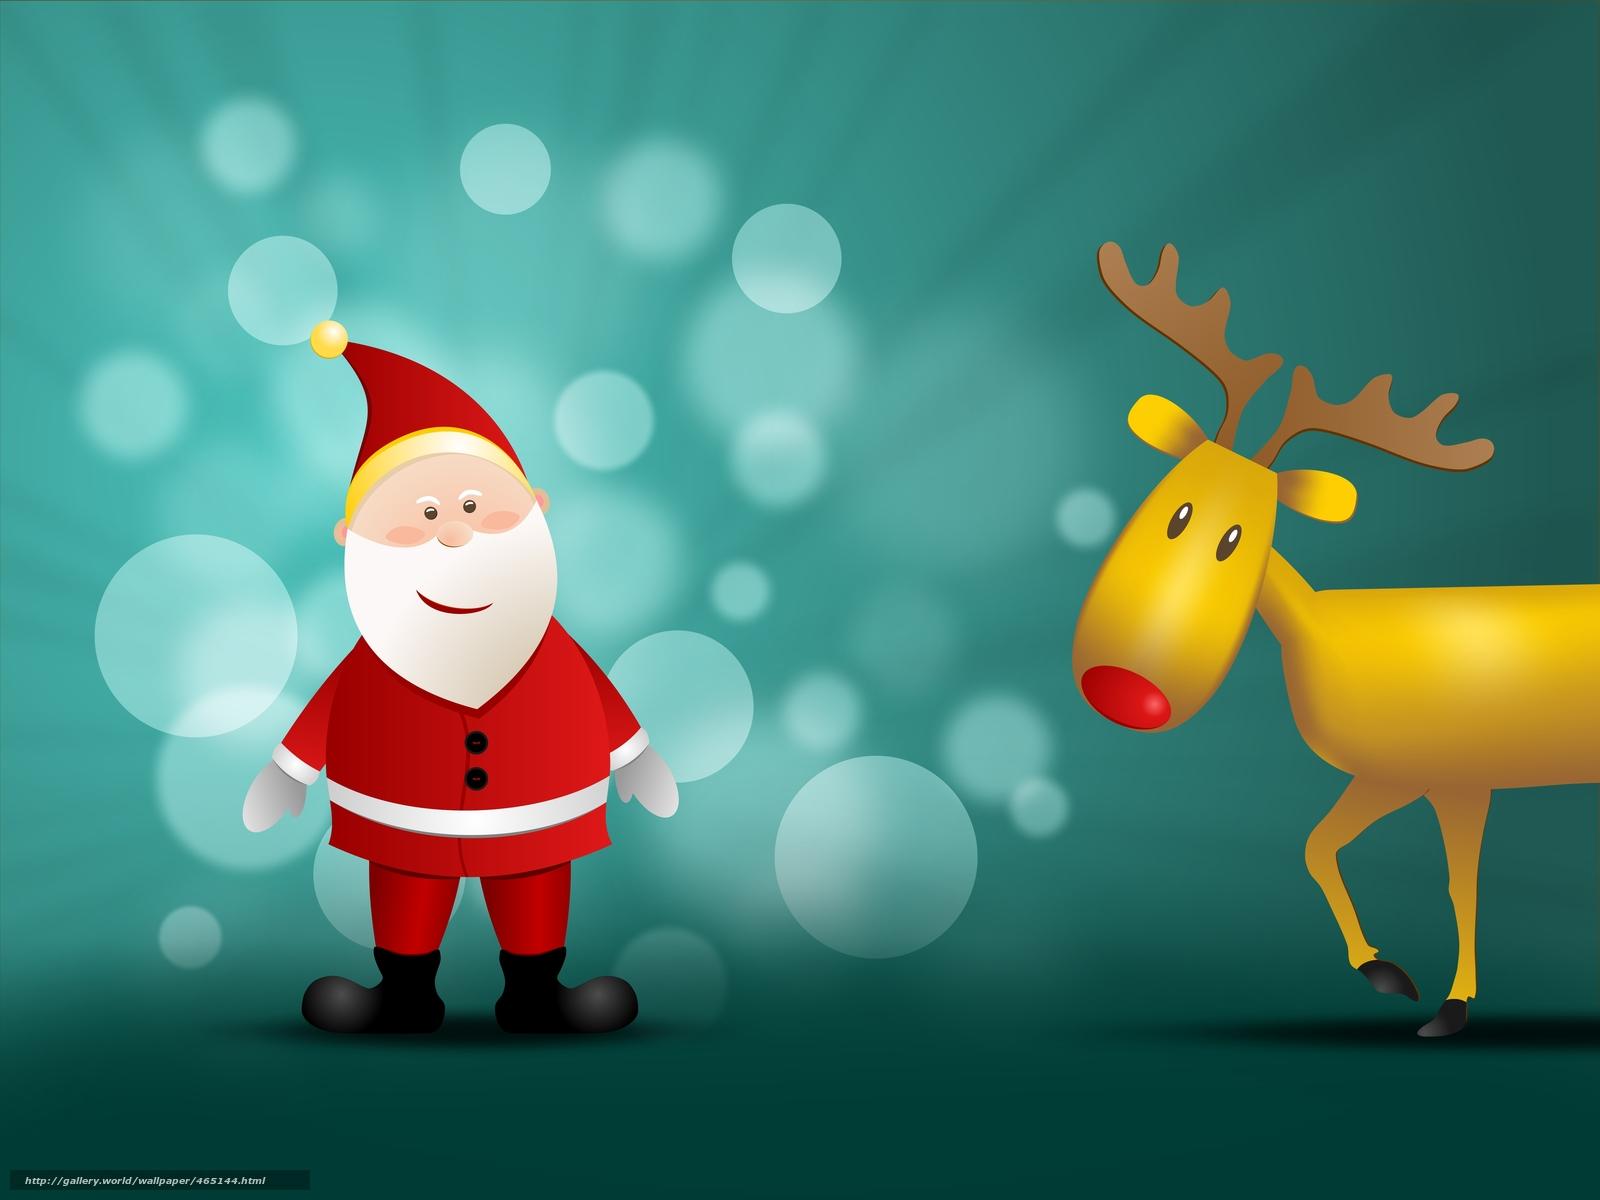 Happy New Year Frame APK Download - Android Фотография Приложения